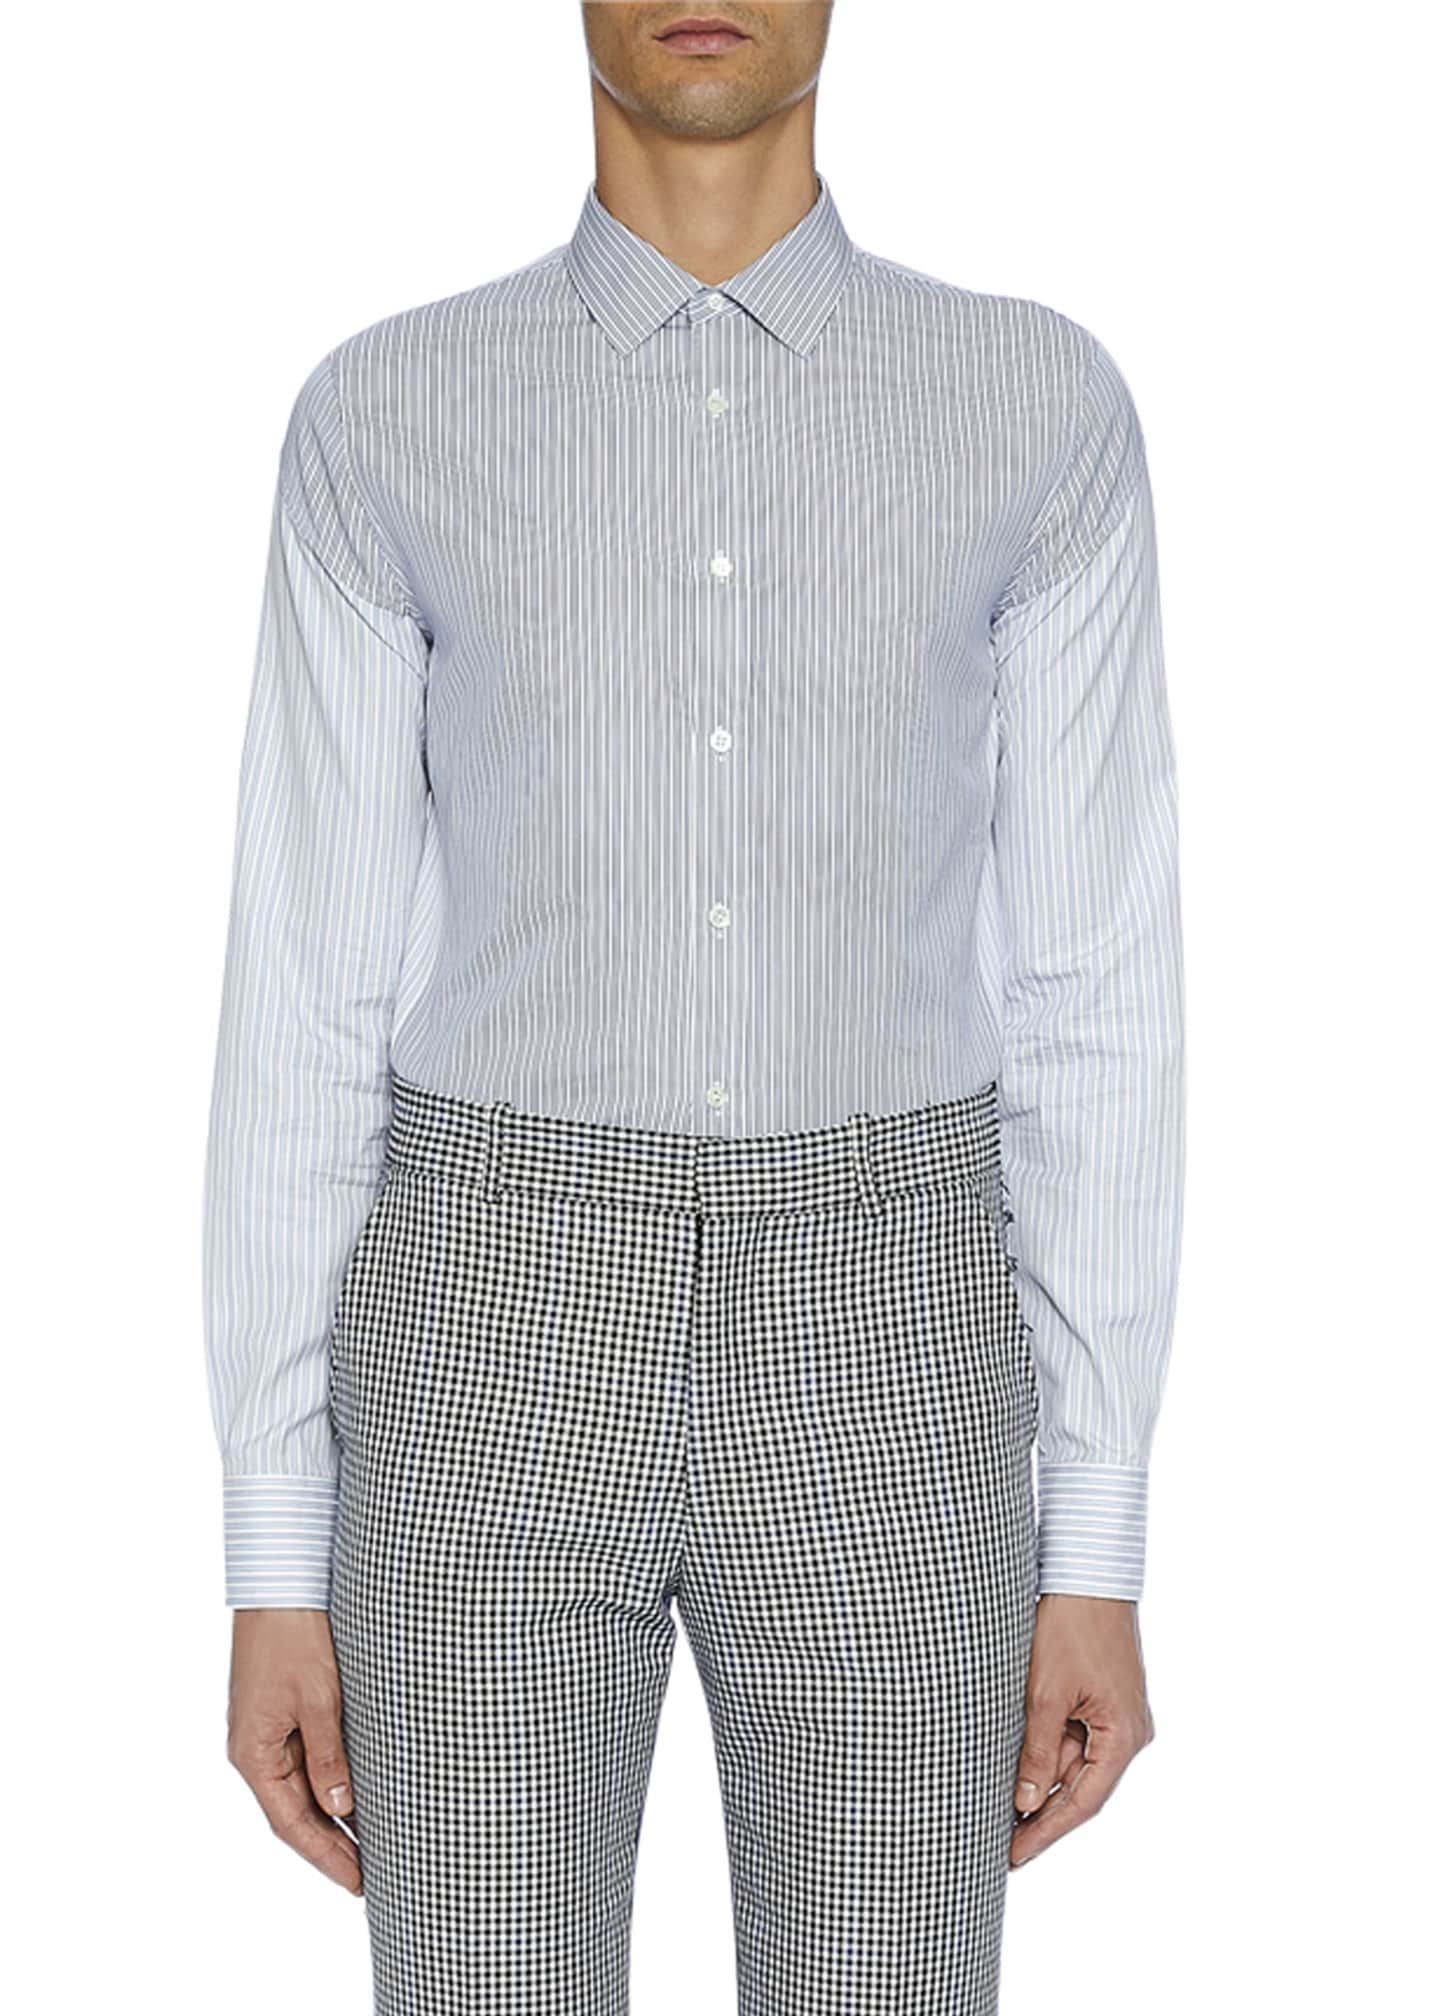 Alexander McQueen Men's Long-Sleeve Two-Tone Button-Front Shirt